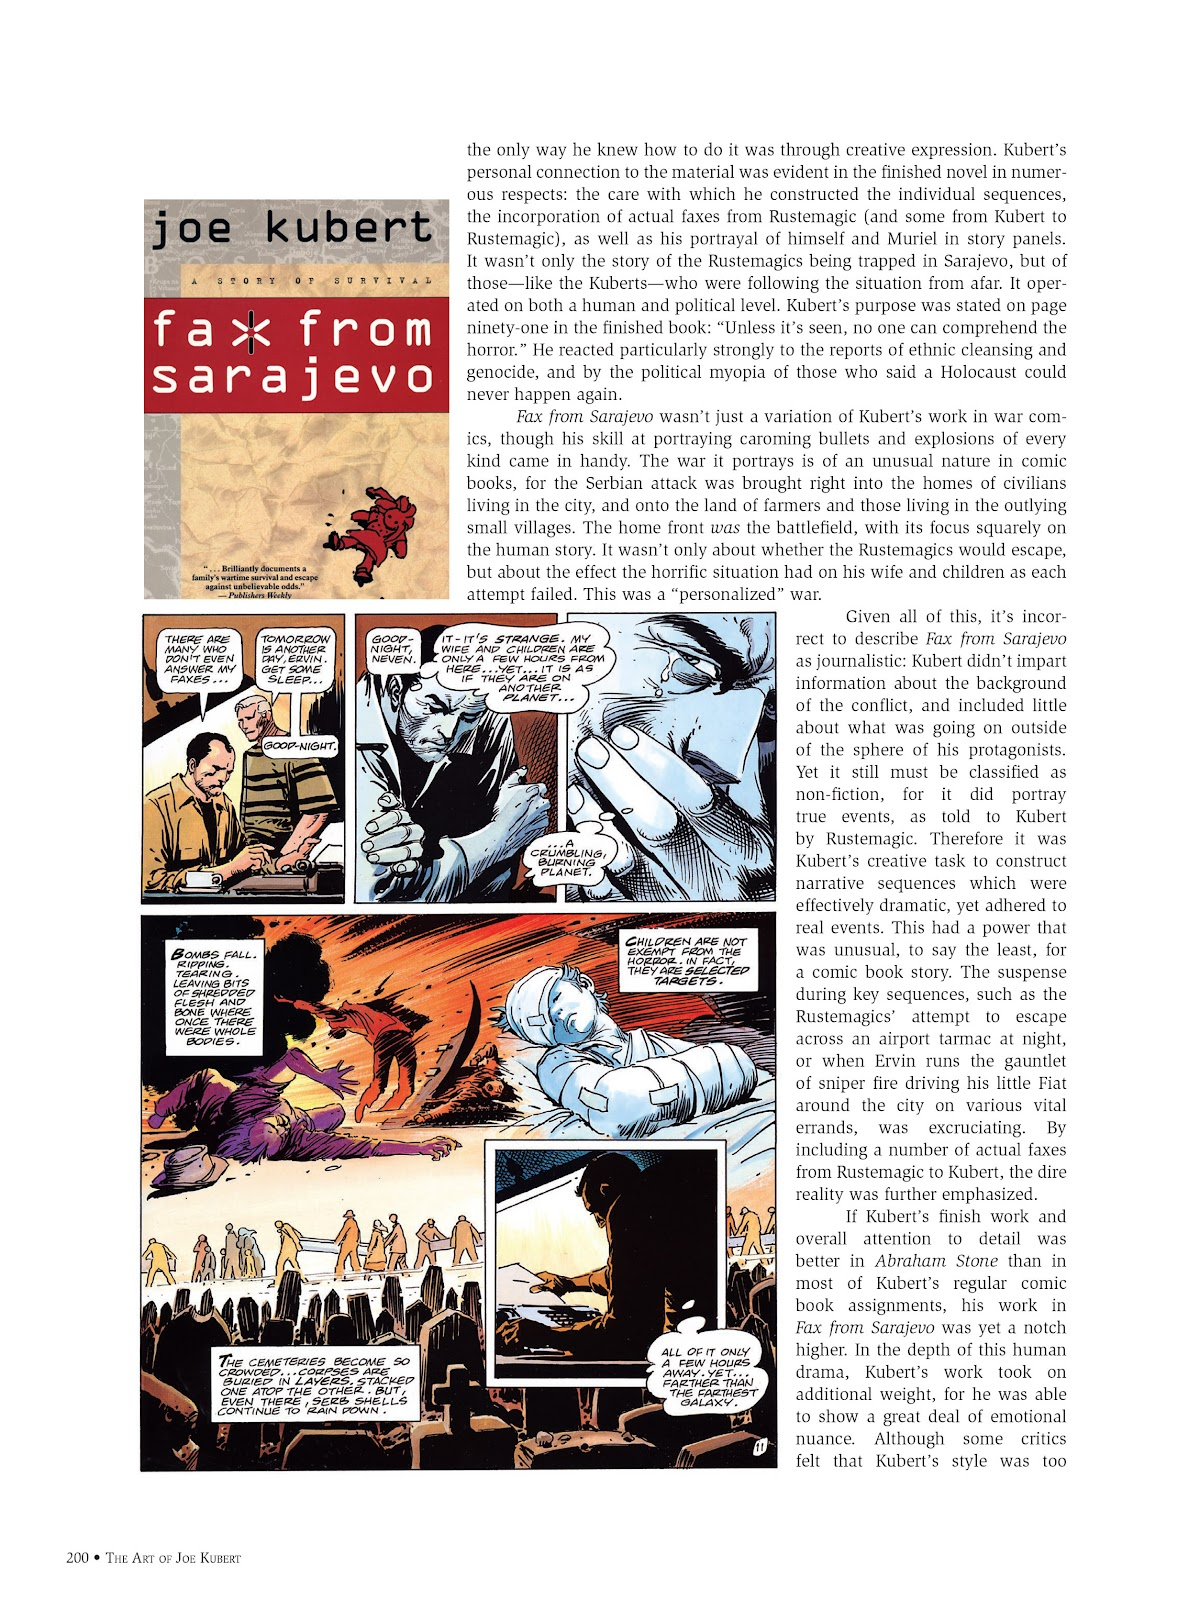 Read online The Art of Joe Kubert comic -  Issue # TPB (Part 2) - 100